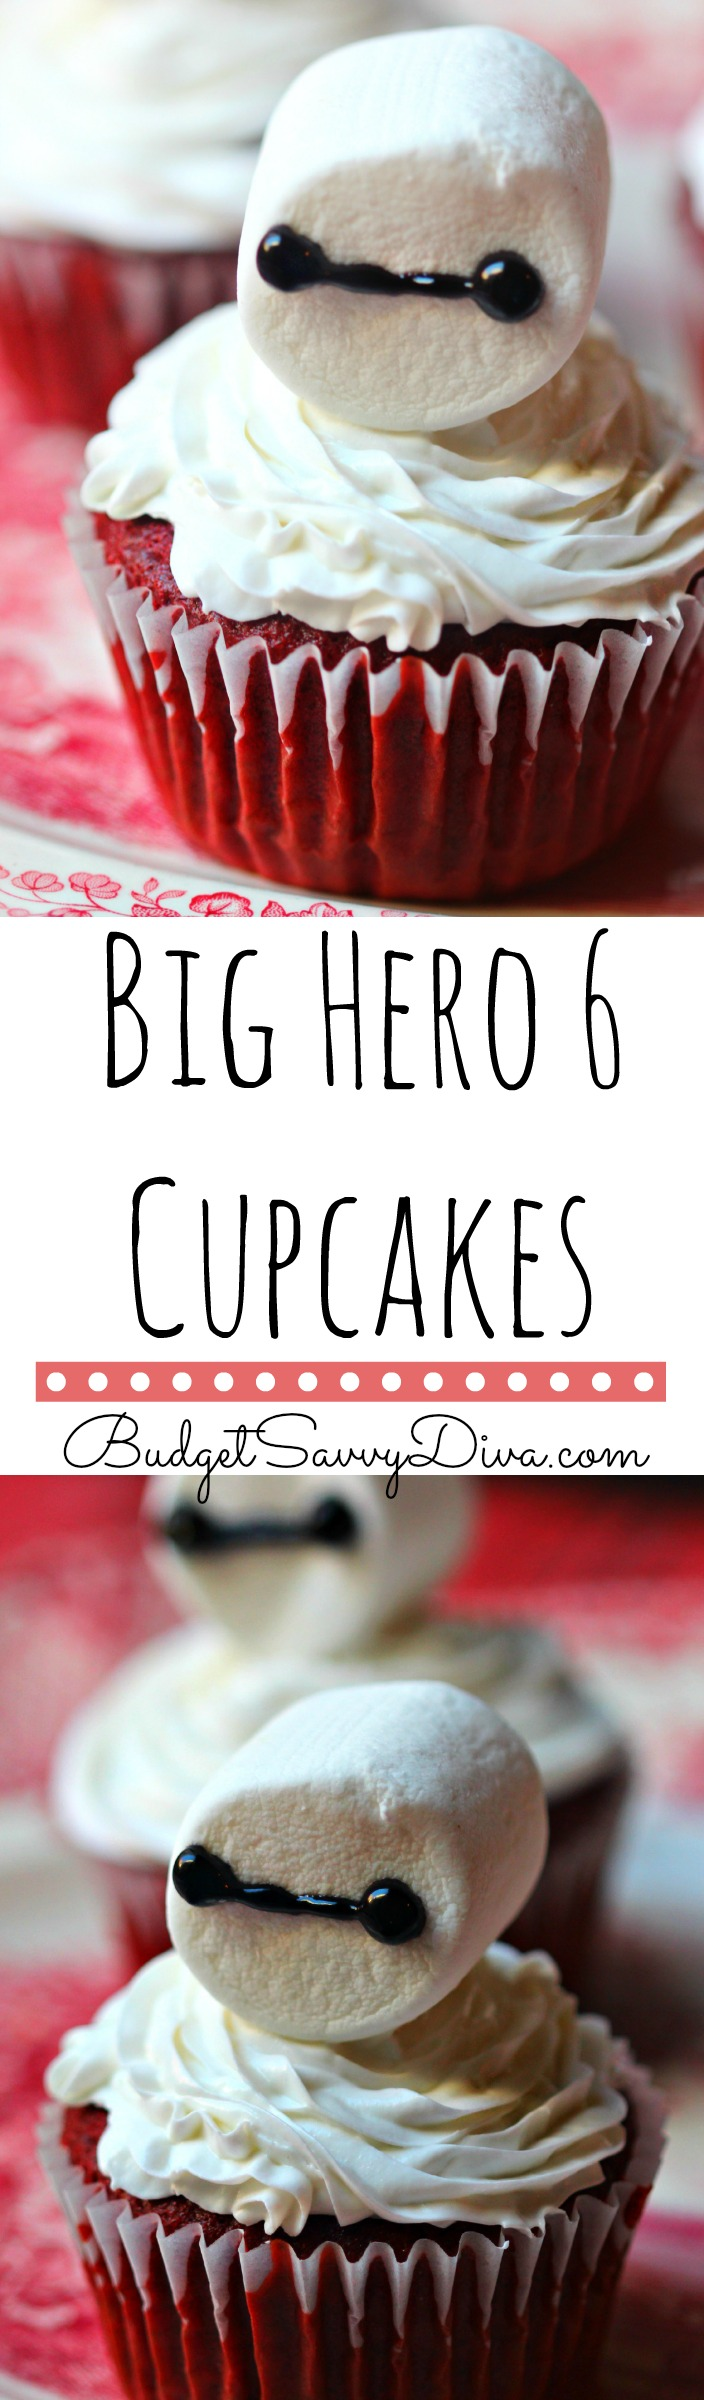 Big Hero 6 Cupcakes Recipe - Baymax